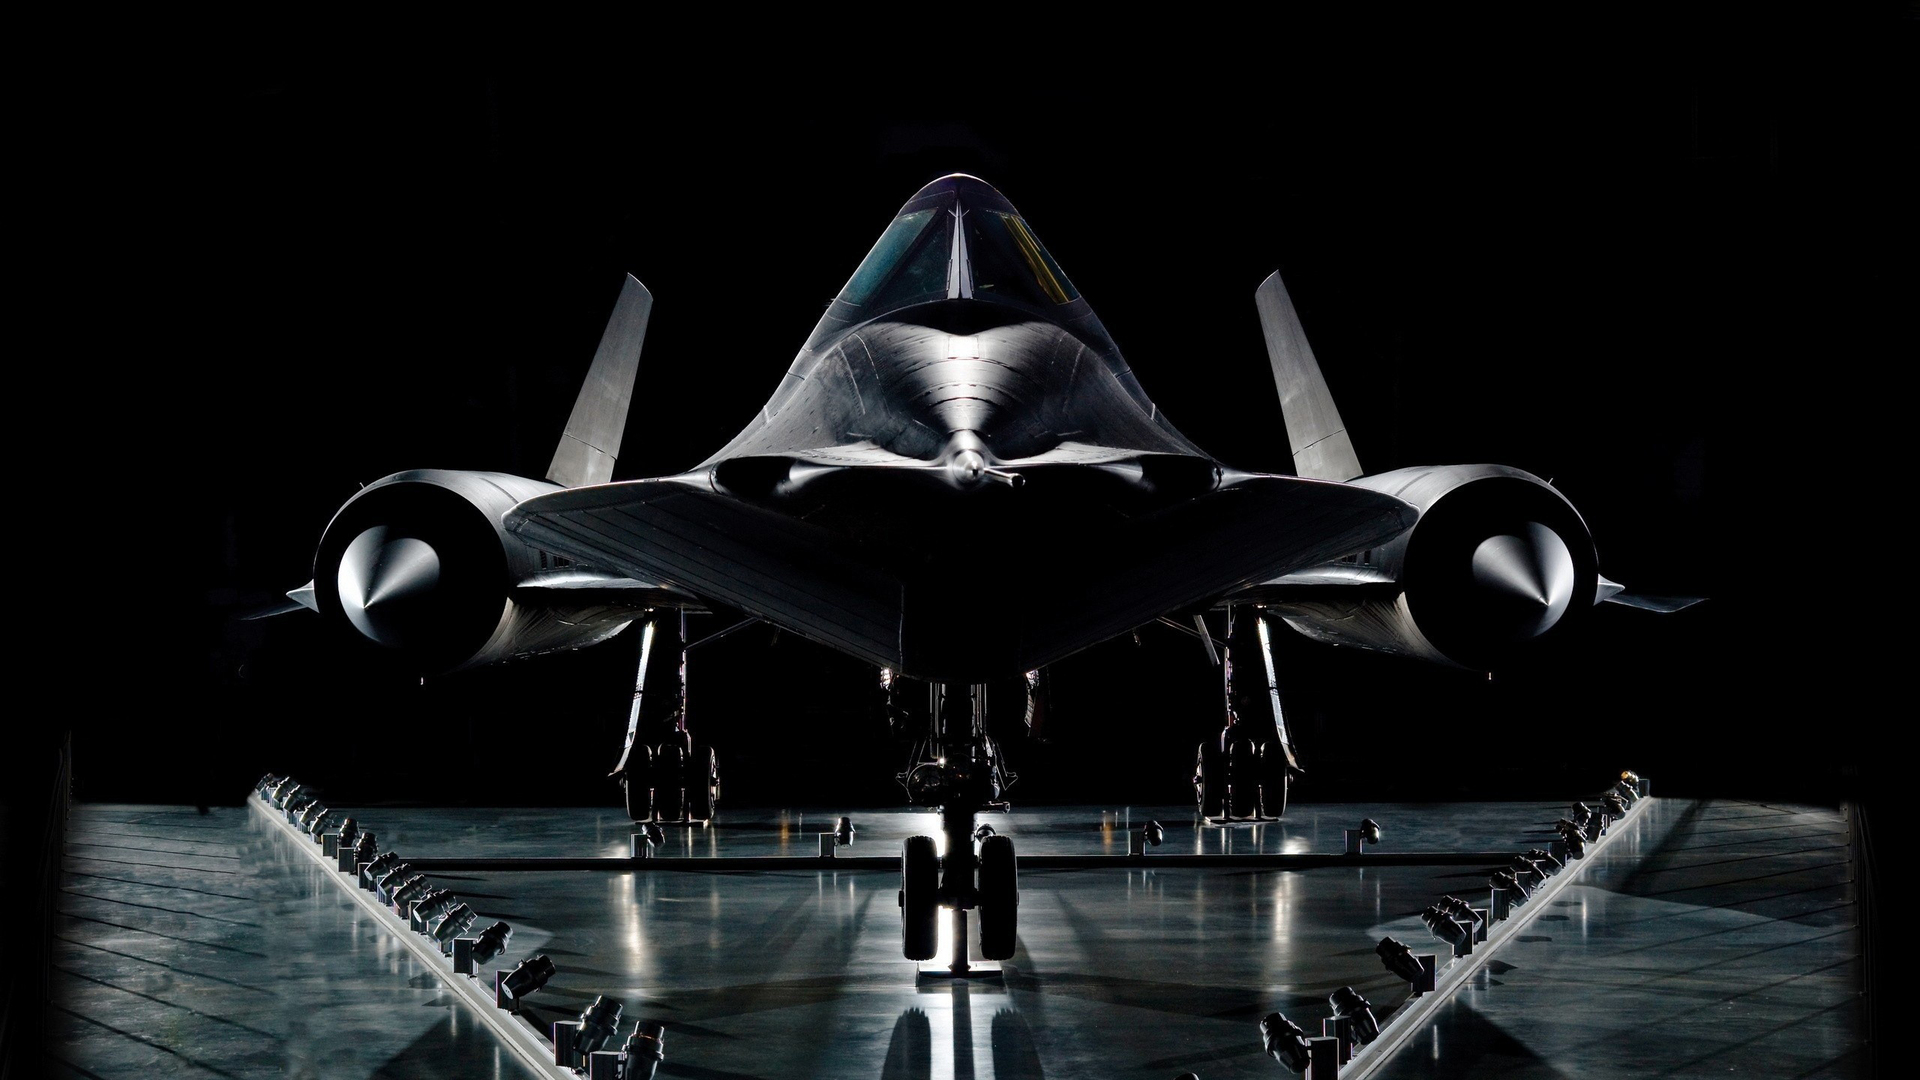 sr blackbird 71 lockheed plane background dark aircraft airplane bird sr71 air wallpapers military stealth wall night nasa